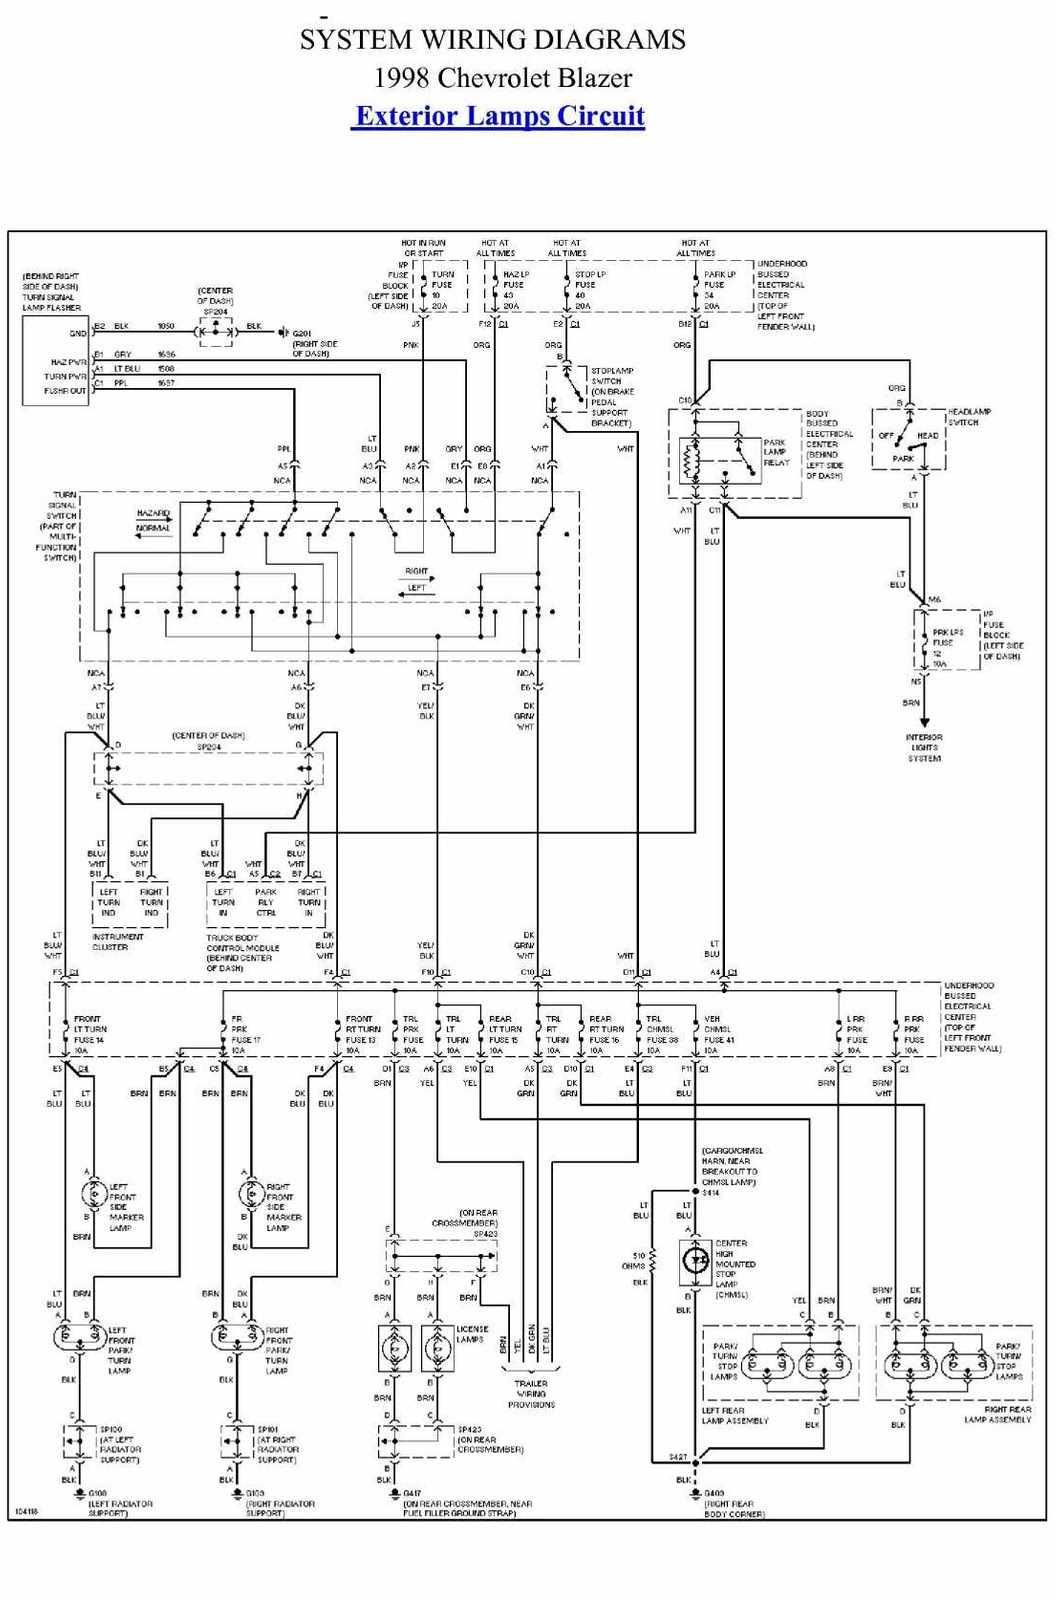 hight resolution of 1998 blazer wiring diagram wiring diagram expert 98 chevy blazer spark plug wiring diagram 98 blazer wiring diagram